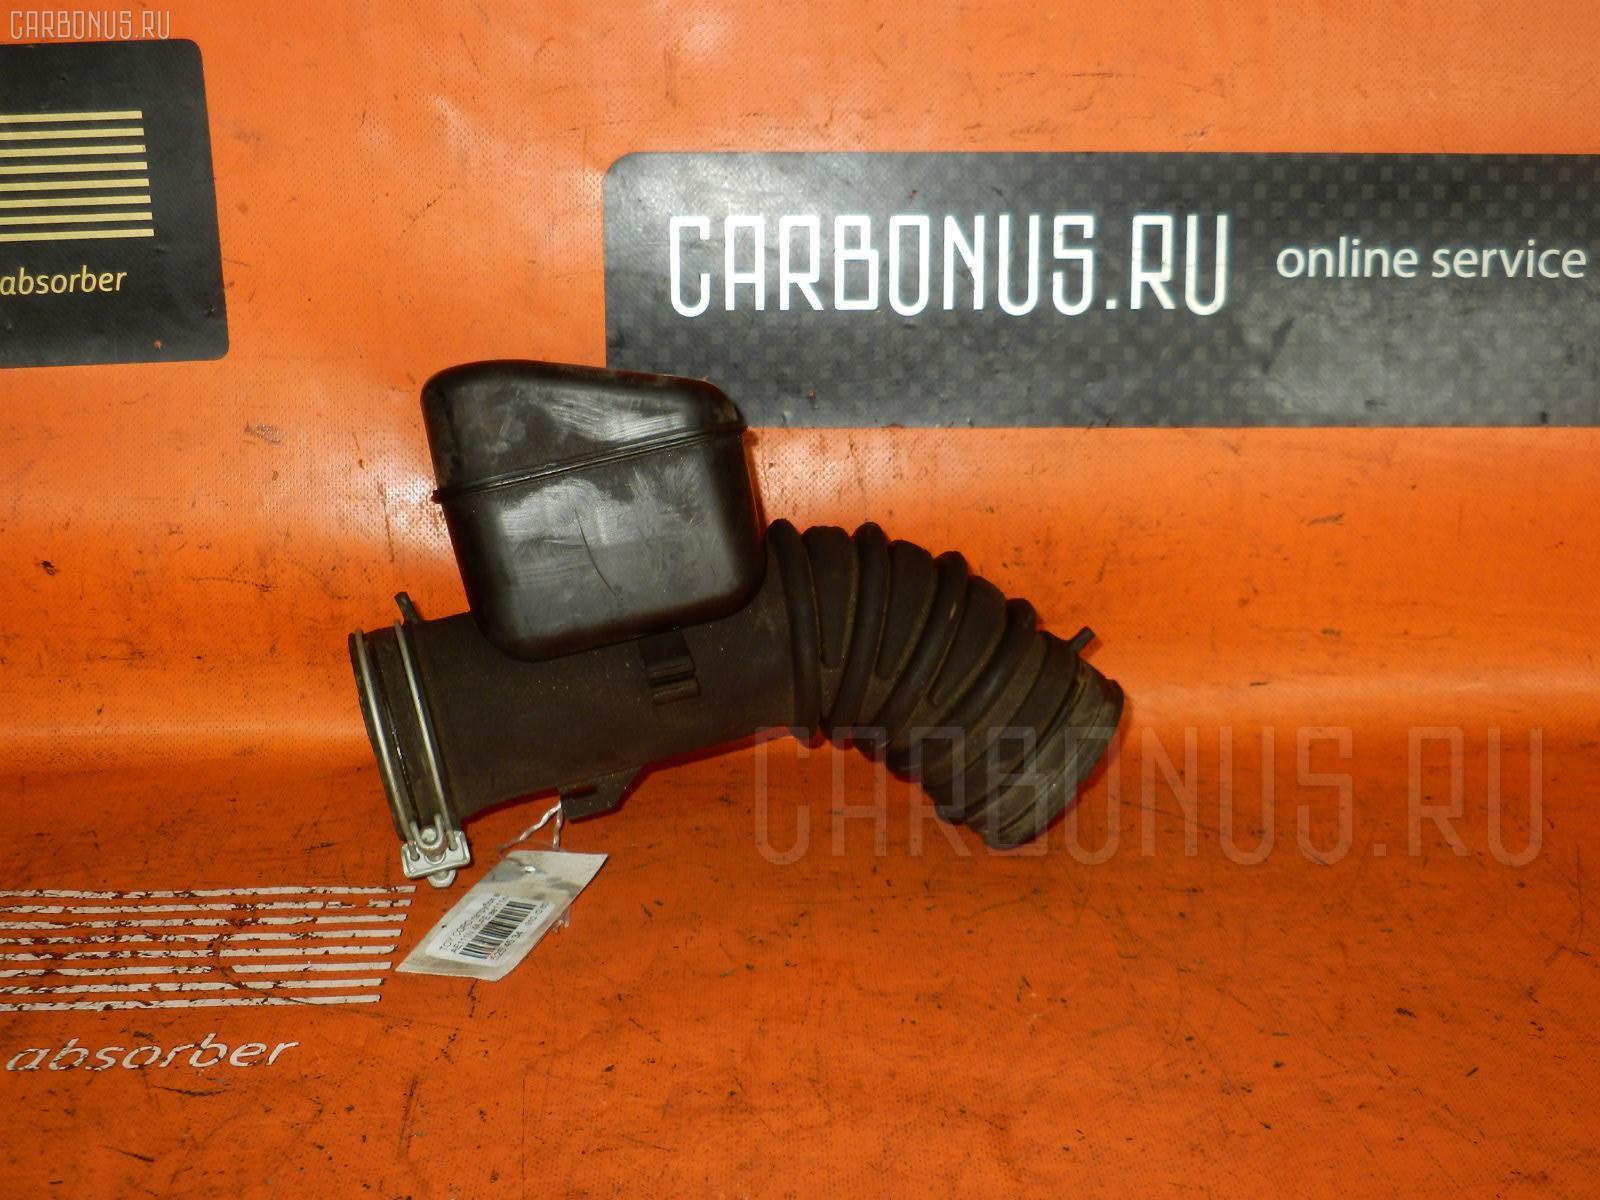 Патрубок воздушн.фильтра 17881-15200 на Toyota Corolla Spacio AE111N 4A-FE Фото 1